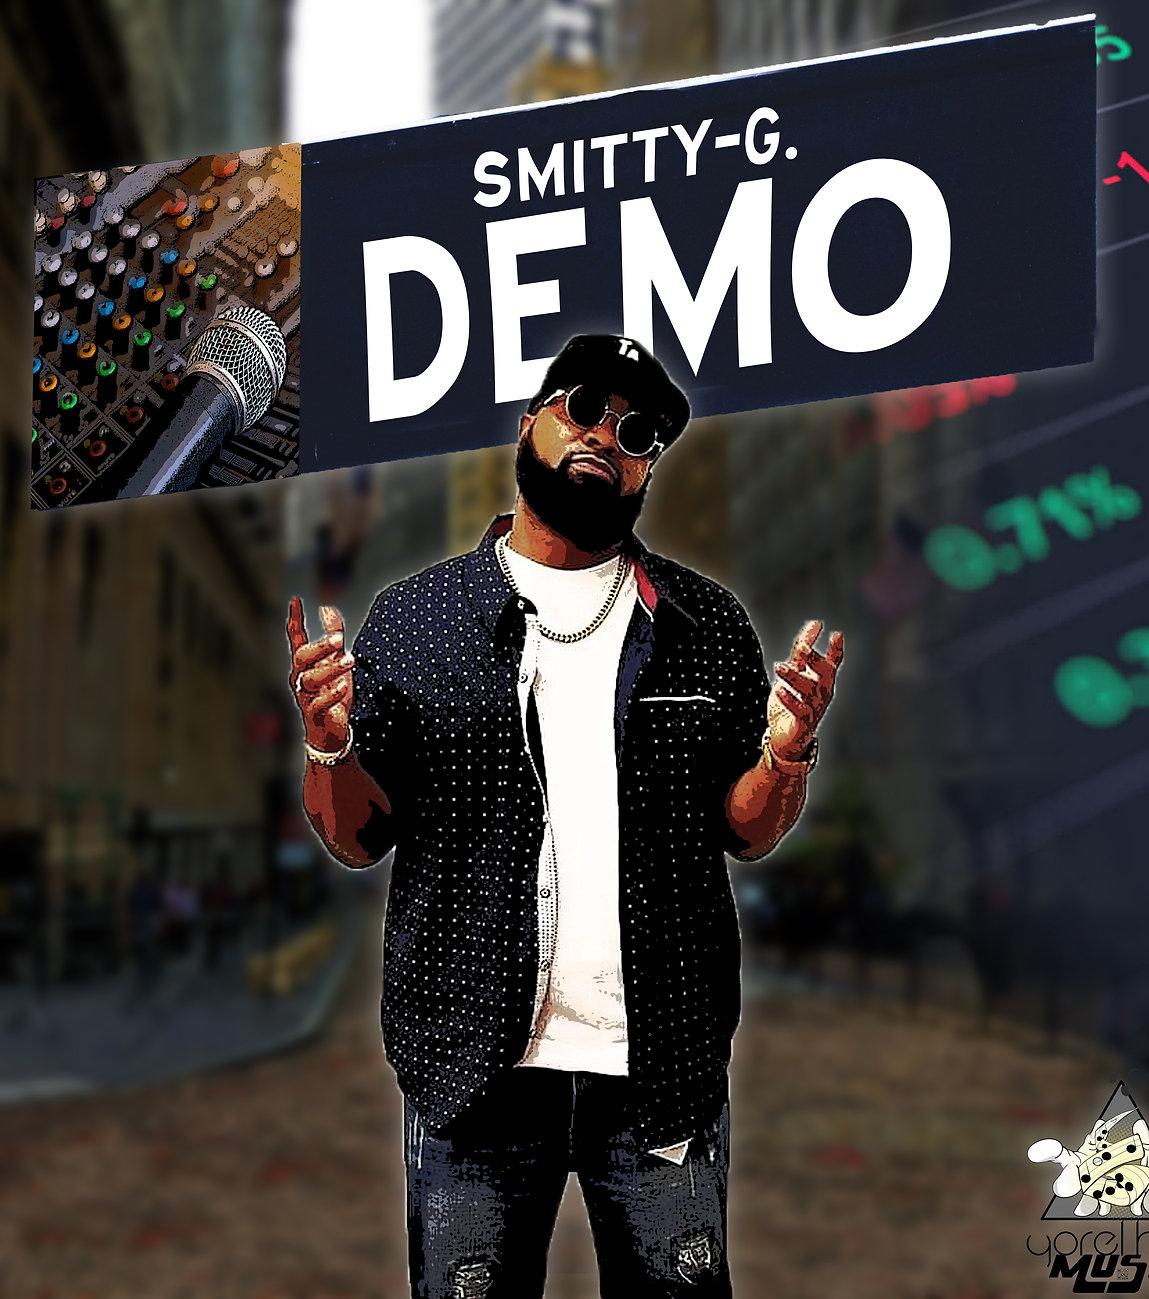 demo album cover 2.jpg